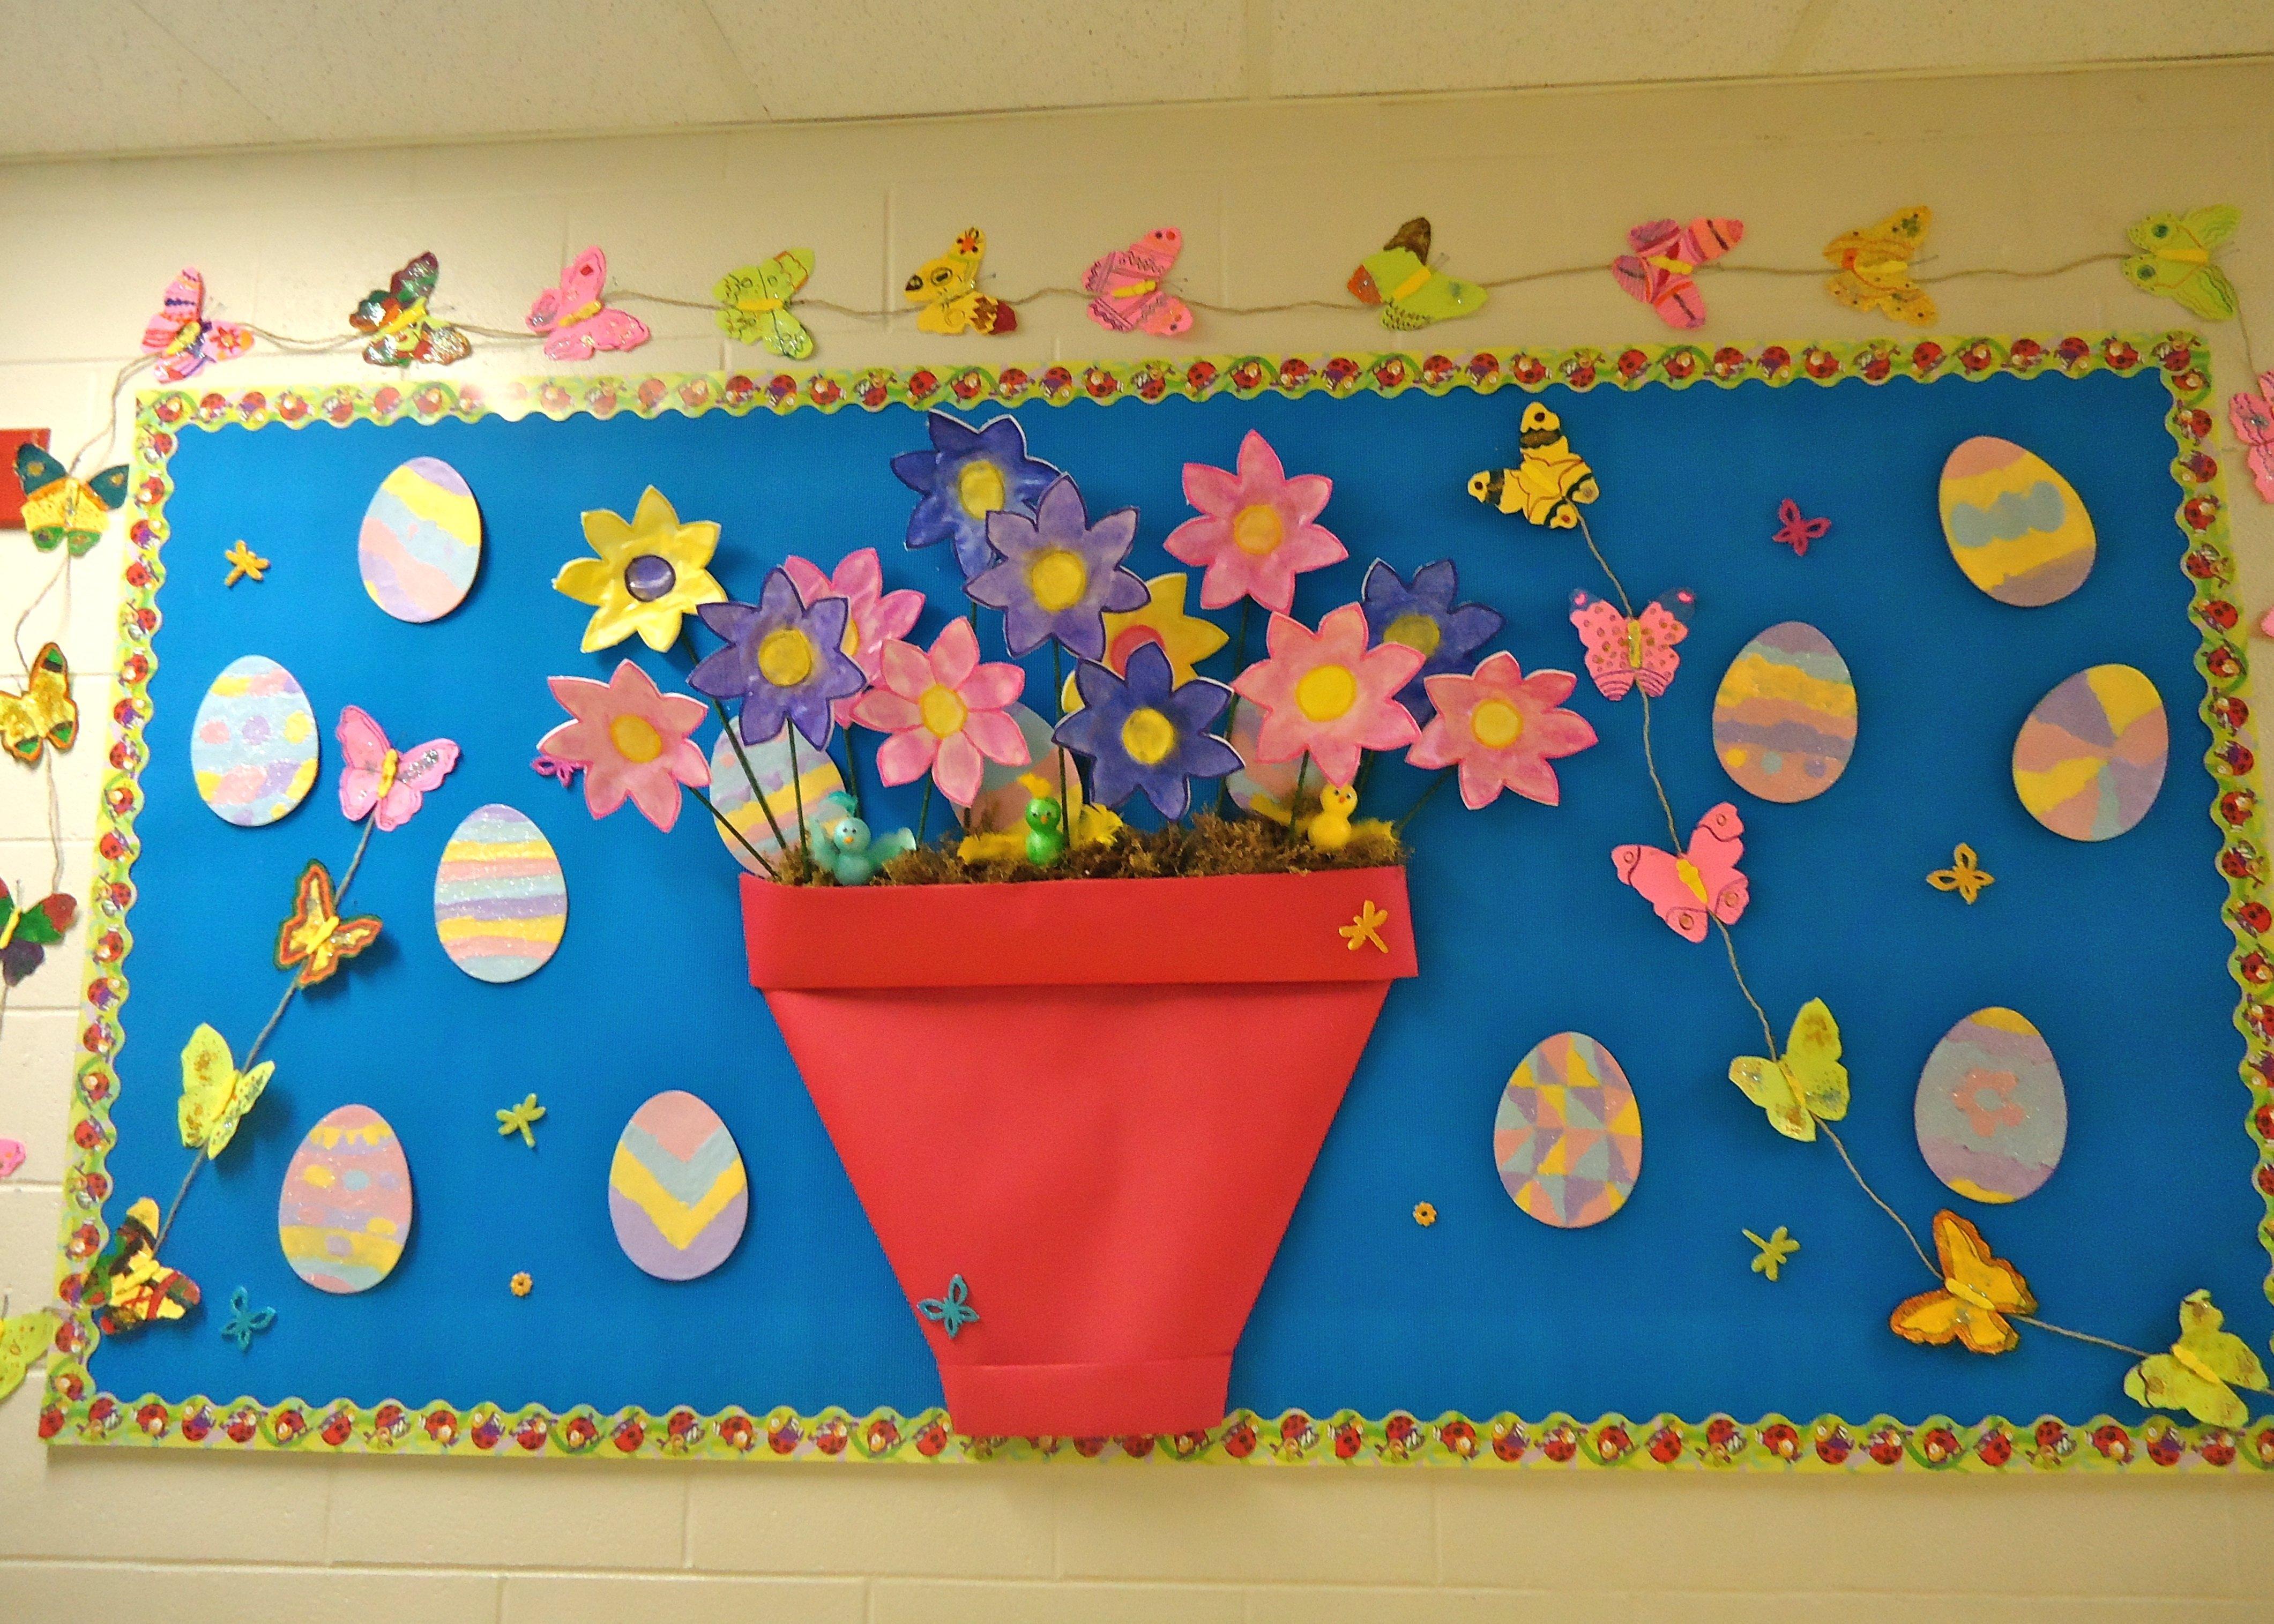 10 Lovable Preschool Spring Bulletin Board Ideas spring bulletin board ideas for preschool classroom spring 2020